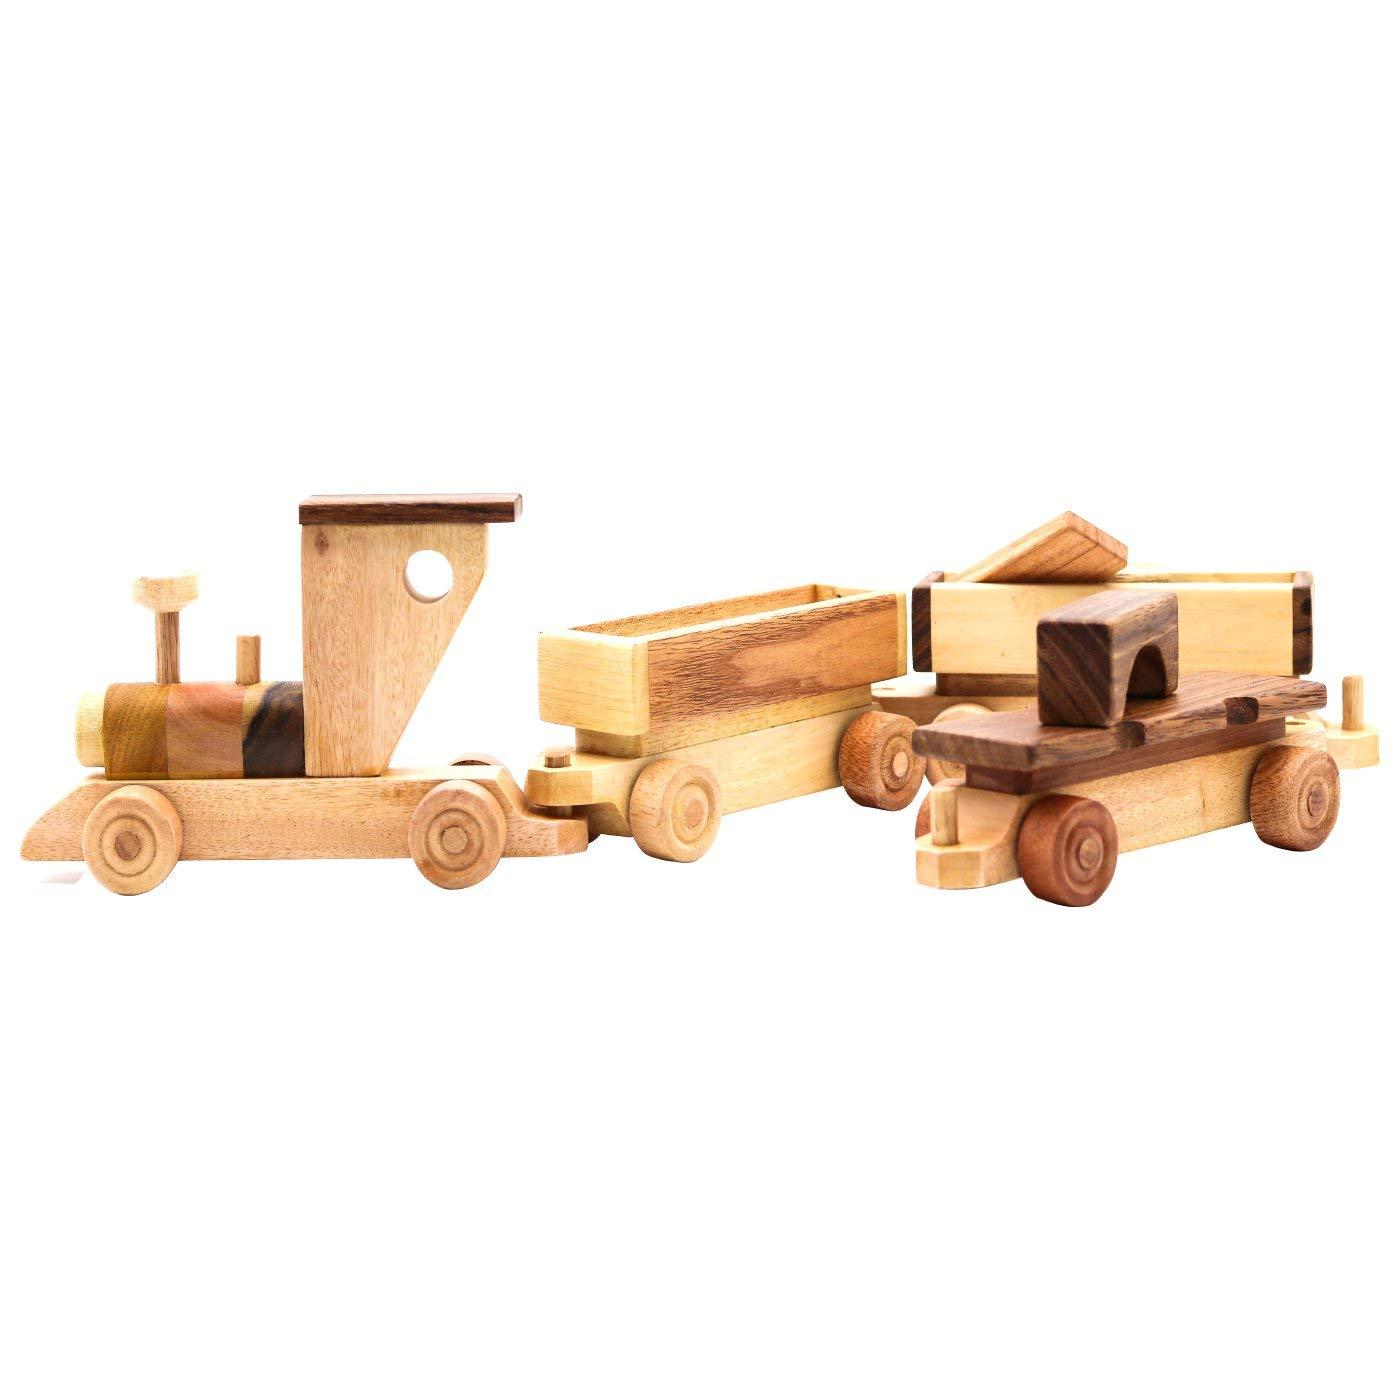 Hajito Wooden Toy Train Play Set, Push Toys, Wooden Toddler Toys, 27'' Long